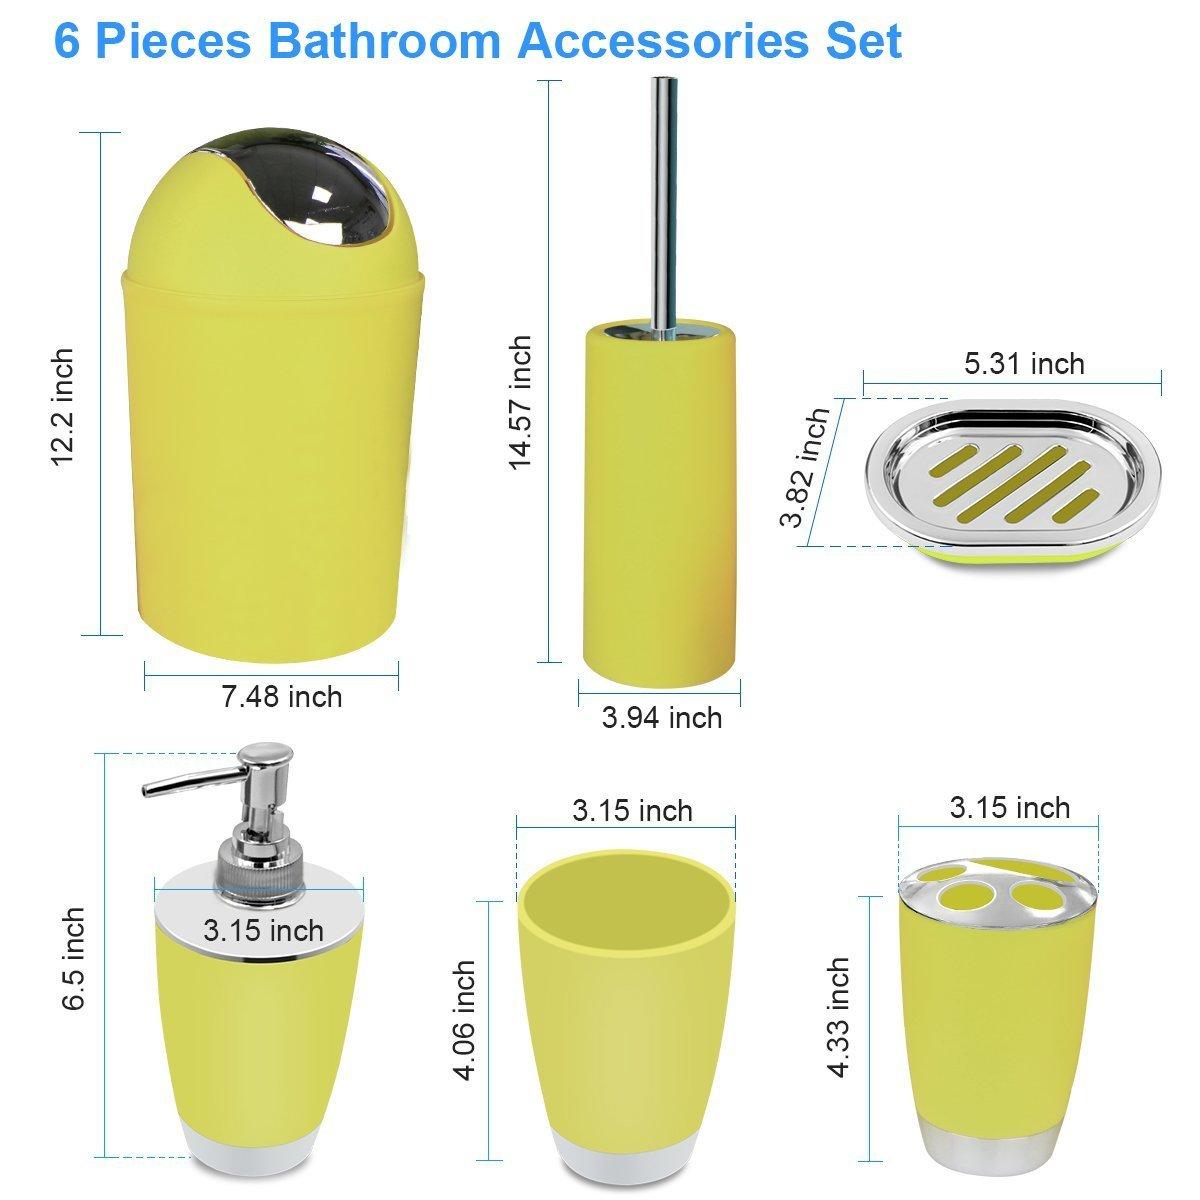 Amazon.com: TEKITSFUN Yellow Bathroom Accessories Set, 6 Piece ...